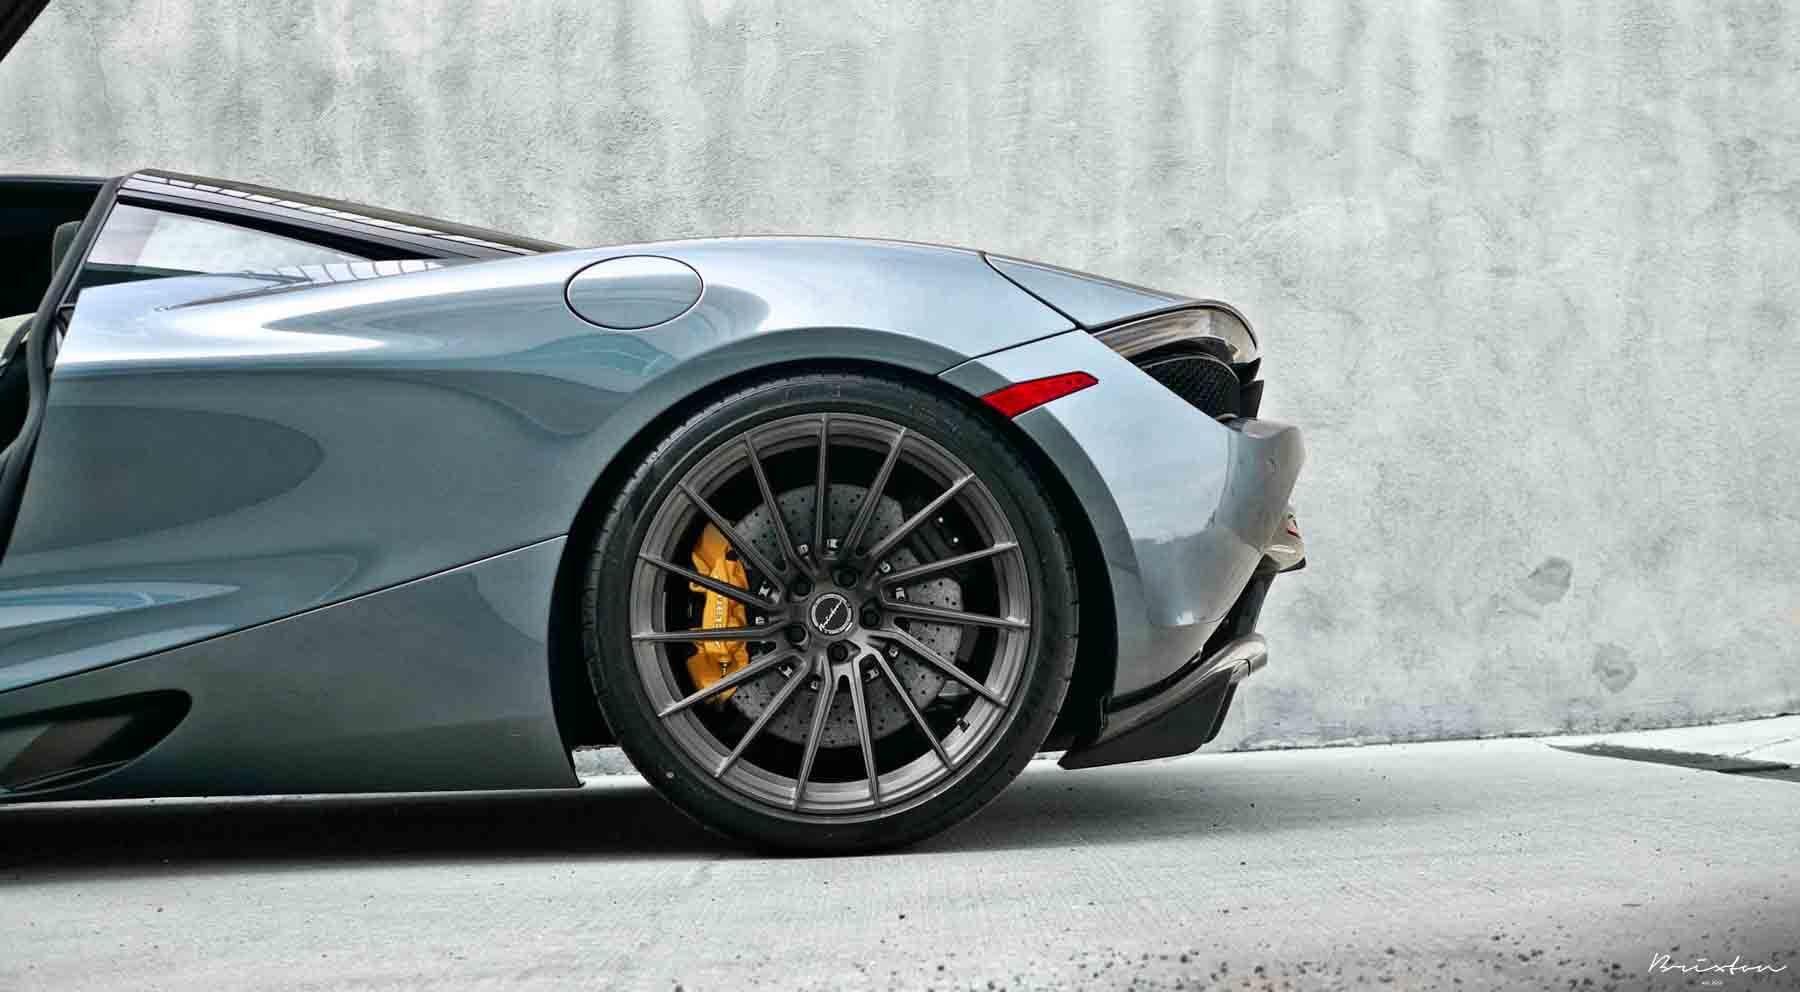 images-products-1-2925-232975213-polaris-blue-mclaren-720s-performance-brixton-forged-wheels-r15-ultrasport-1-piece-concave-brush.jpg